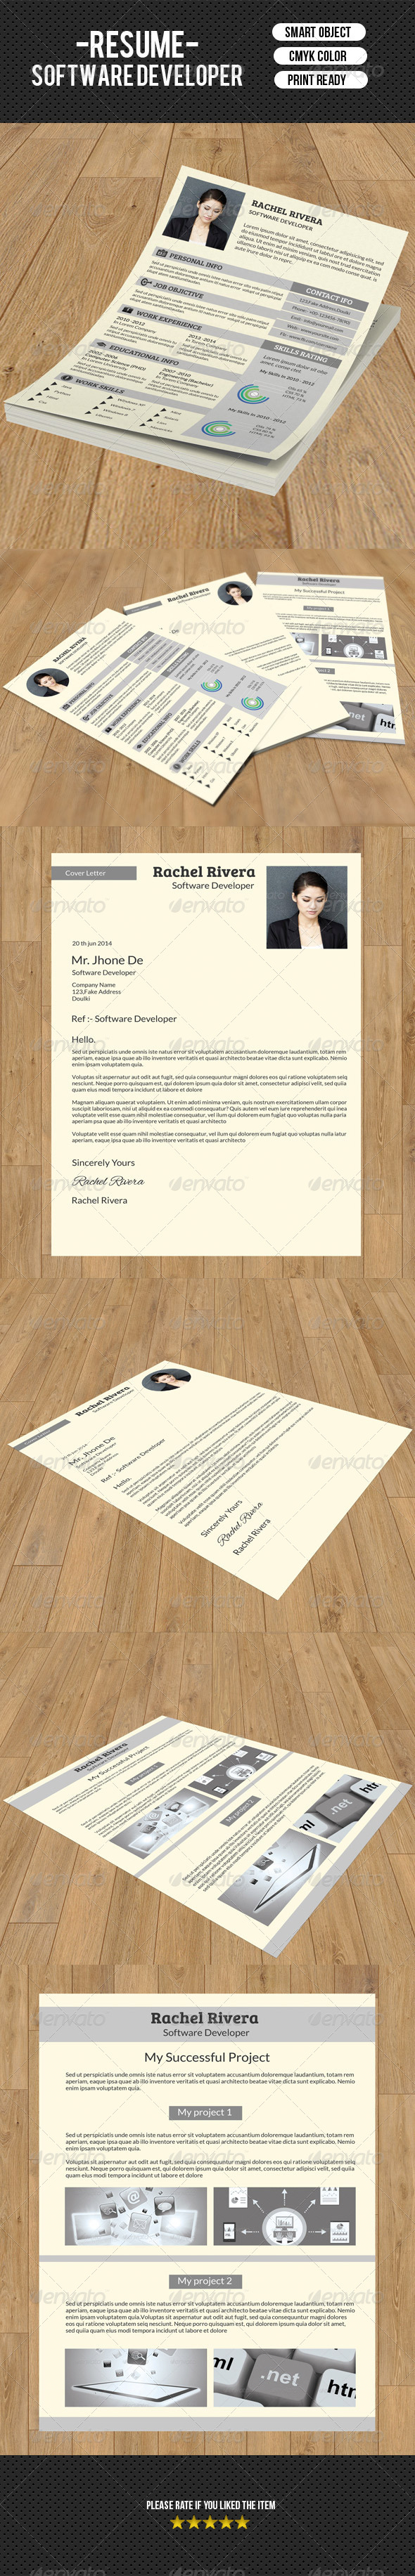 GraphicRiver Classic Resume Template-V05 8101358